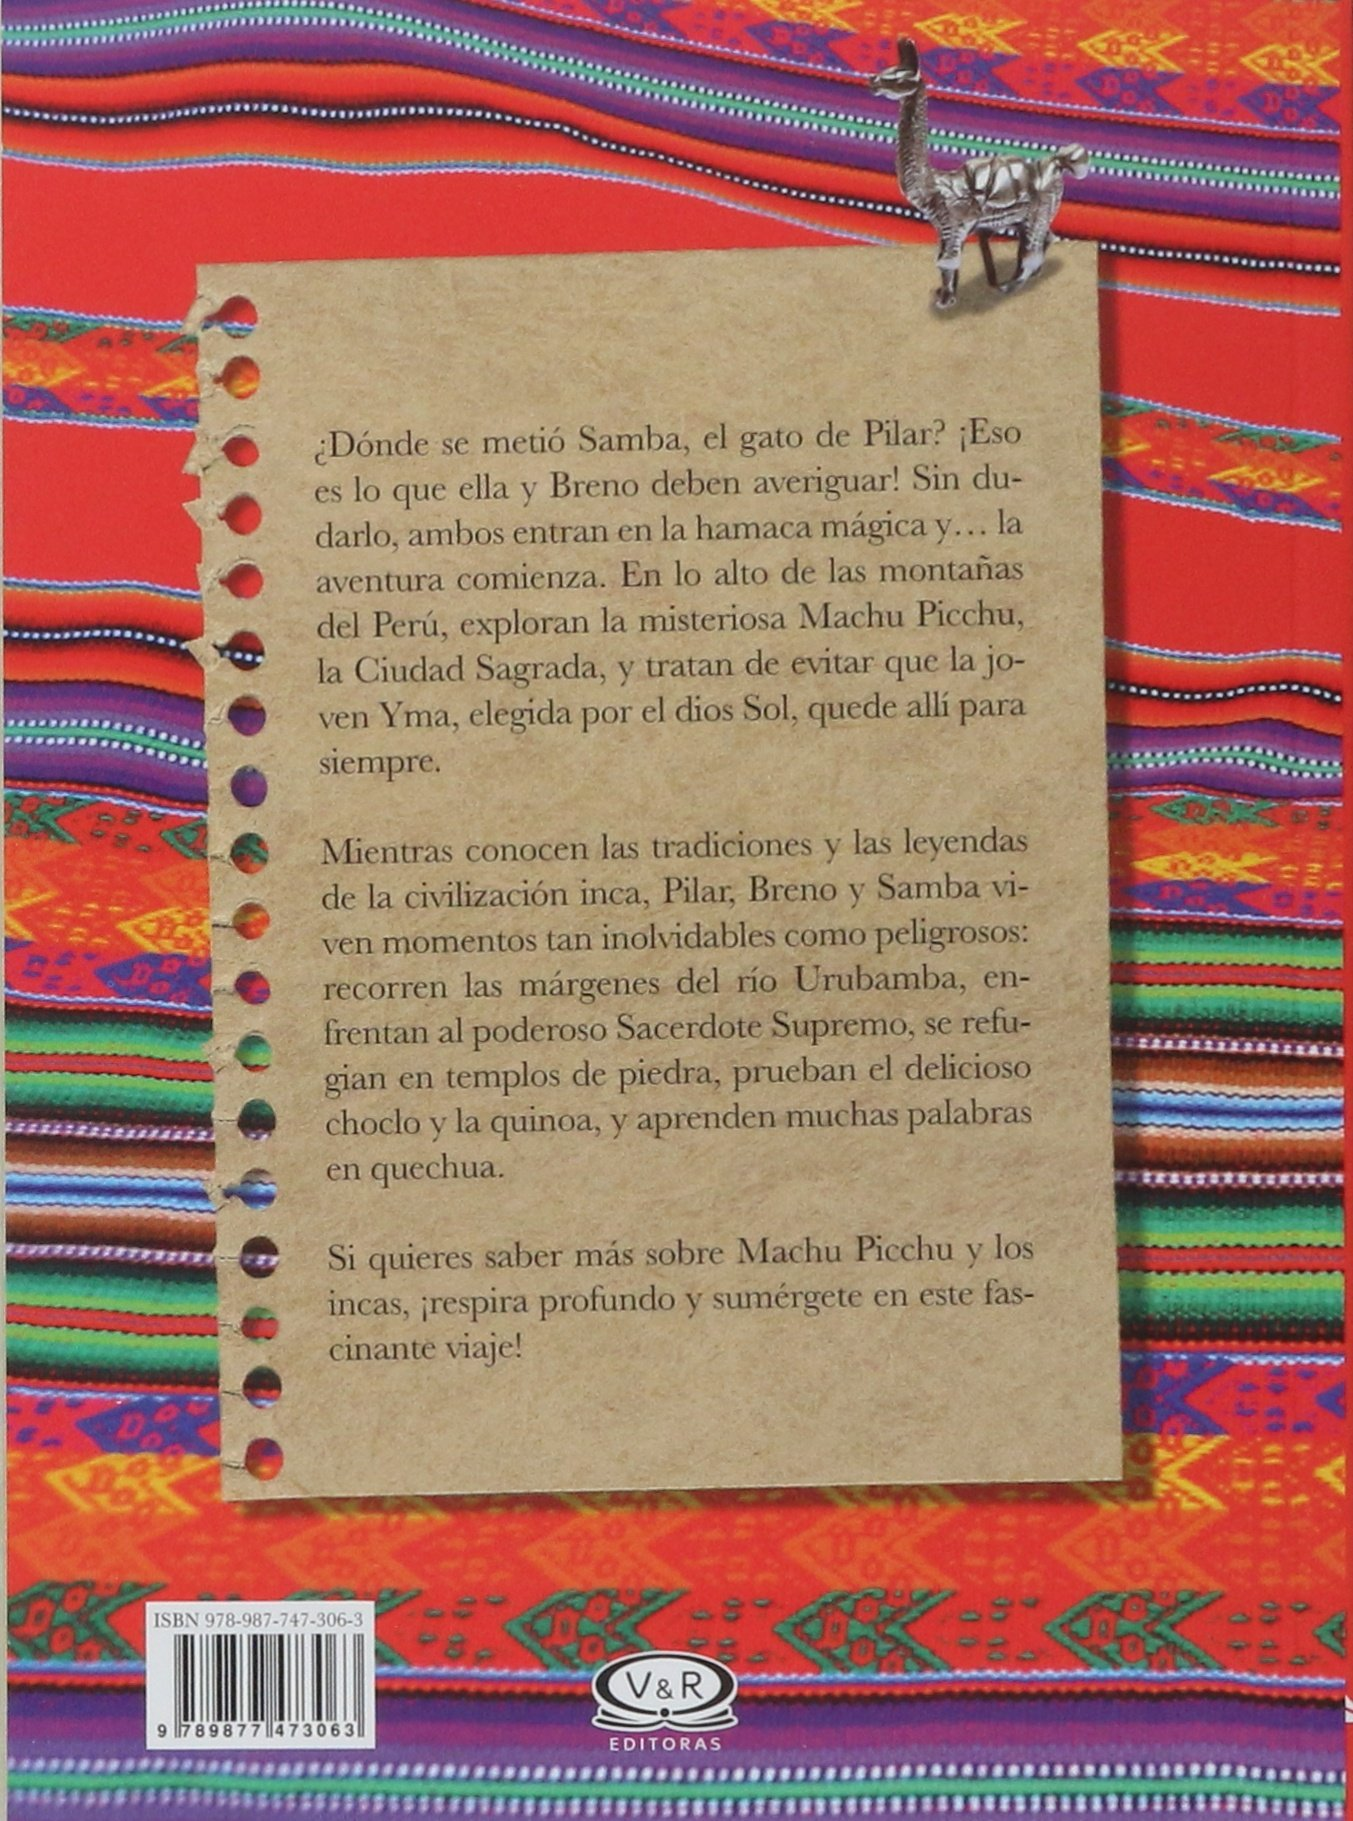 Diario de Pilar en Machu Picchu (Spanish Edition): Flavia Lins e Silva, V&R, Joana Penna: 9789877473063: Amazon.com: Books